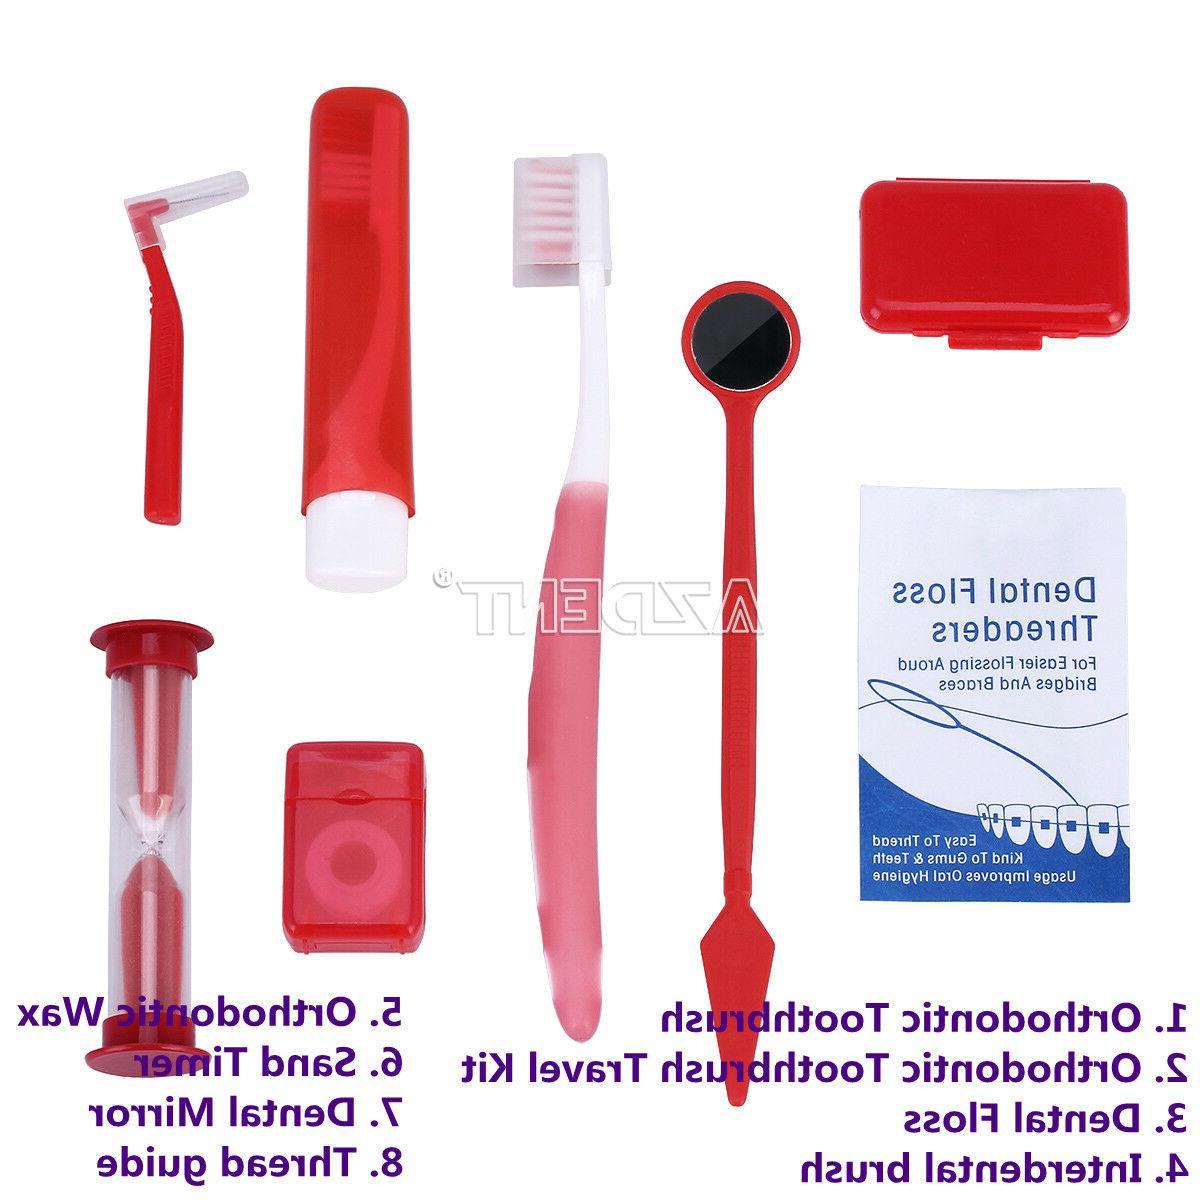 usa 20x ortho brush ties toothbrush interdental